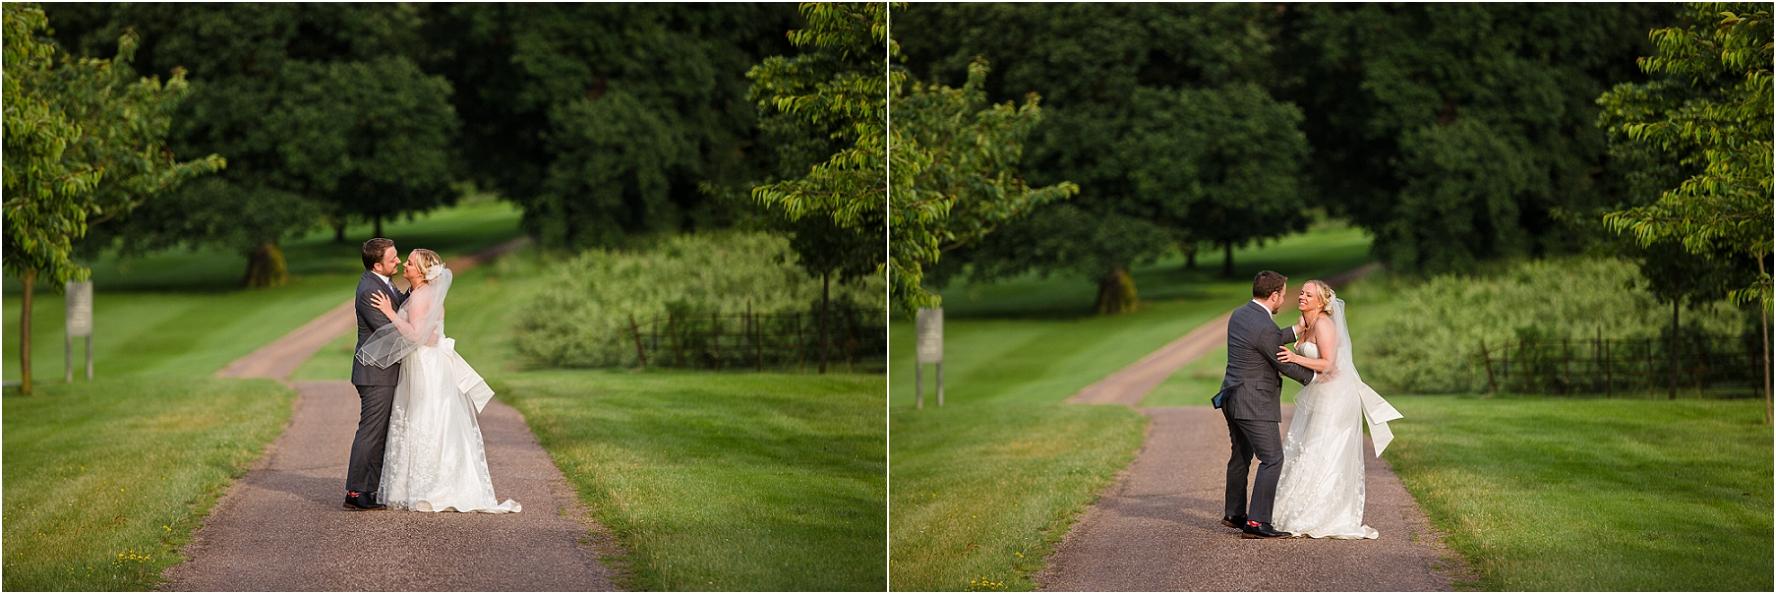 wedding-photography-the-orangery-settringham_0483